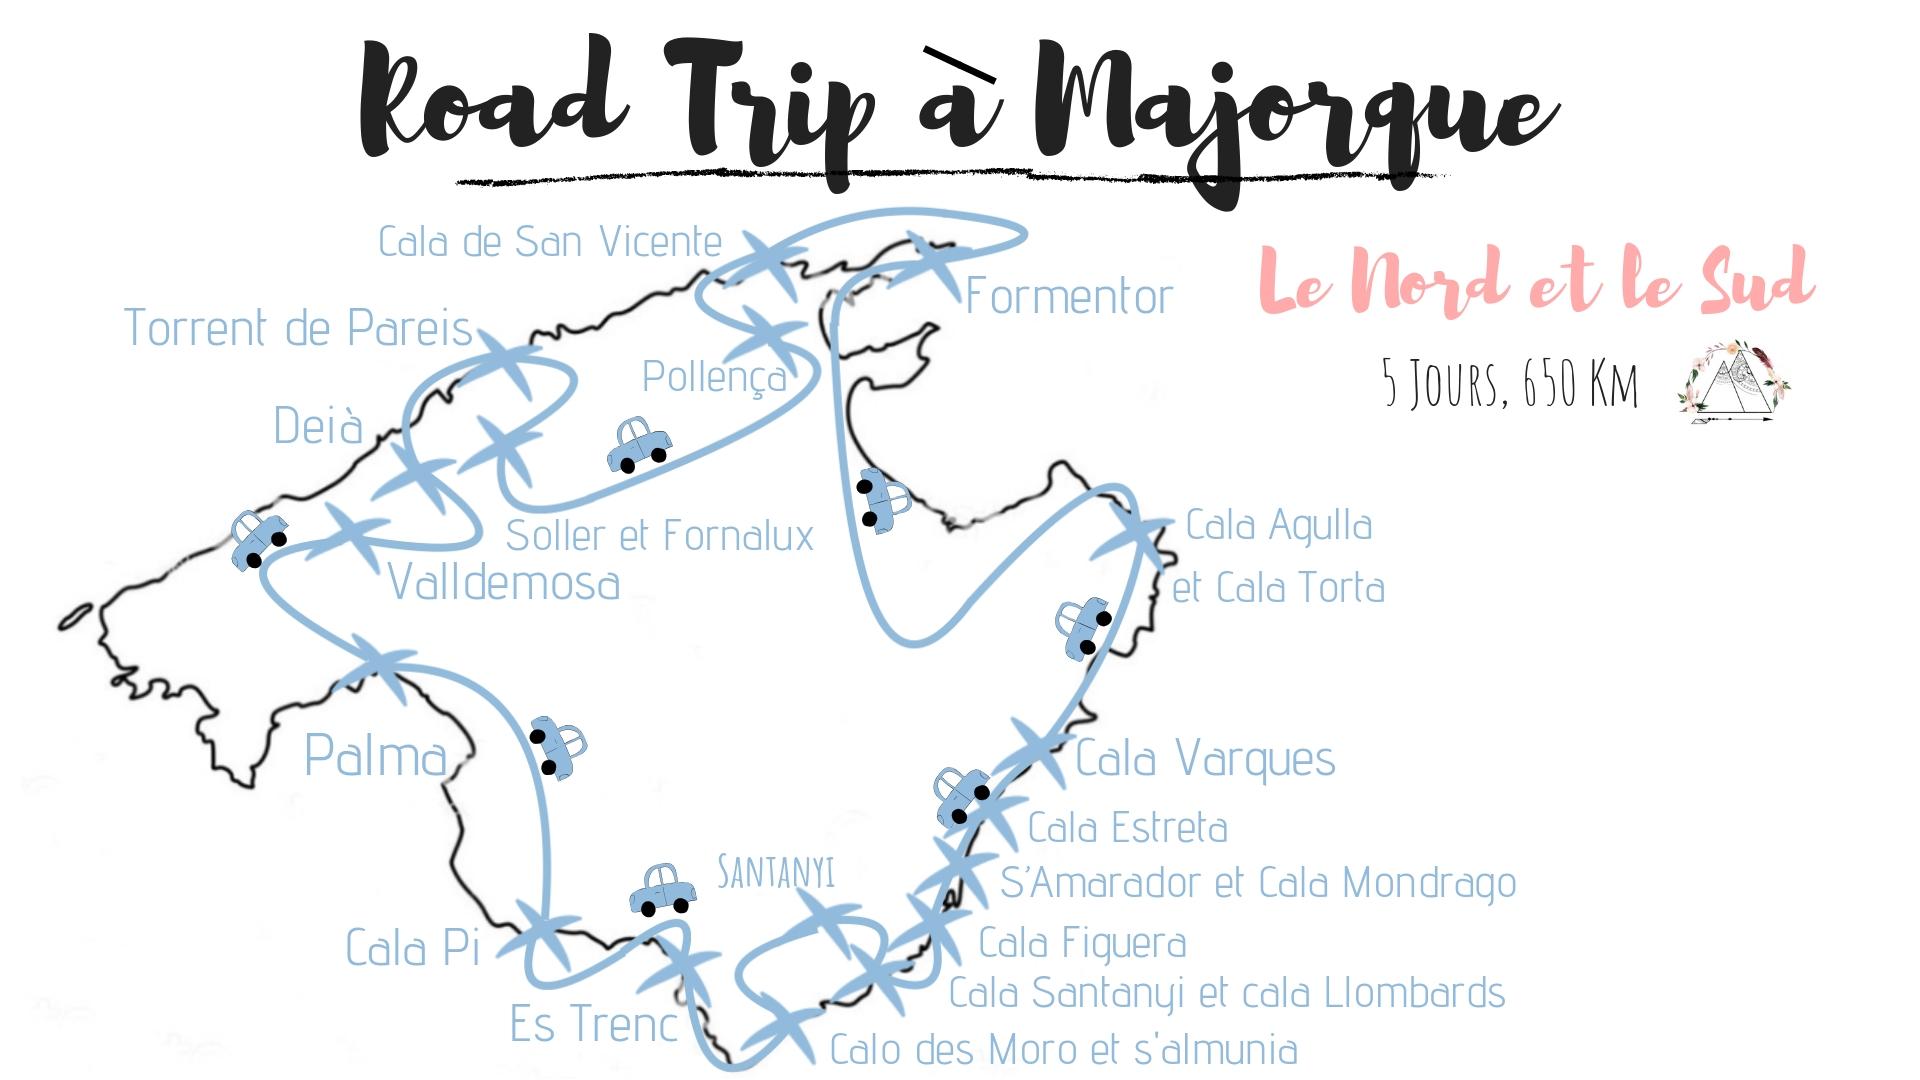 itinéraire road trip majorque idée blog